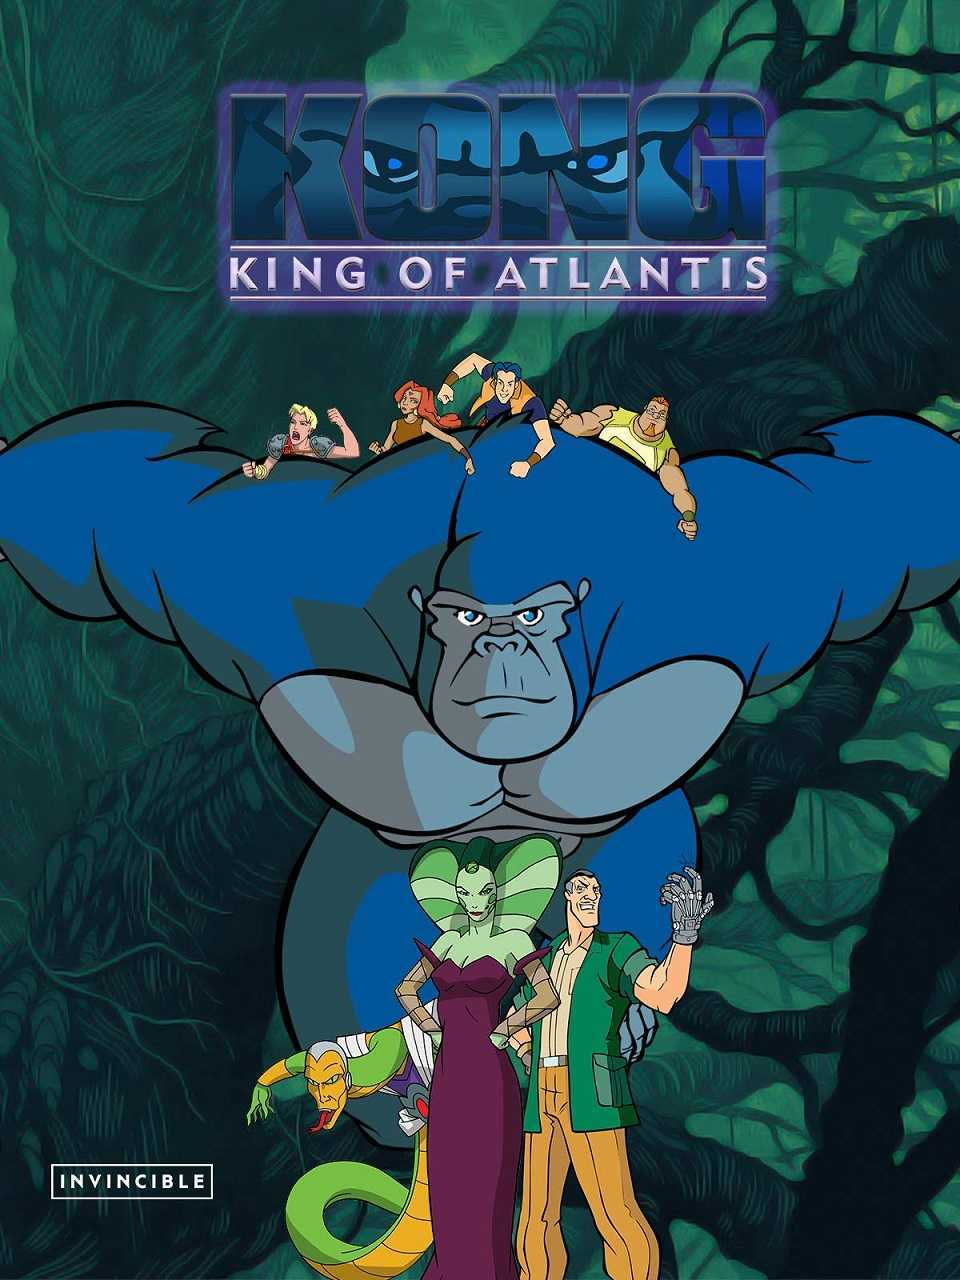 Kong, King of Atlantis (2005) poster